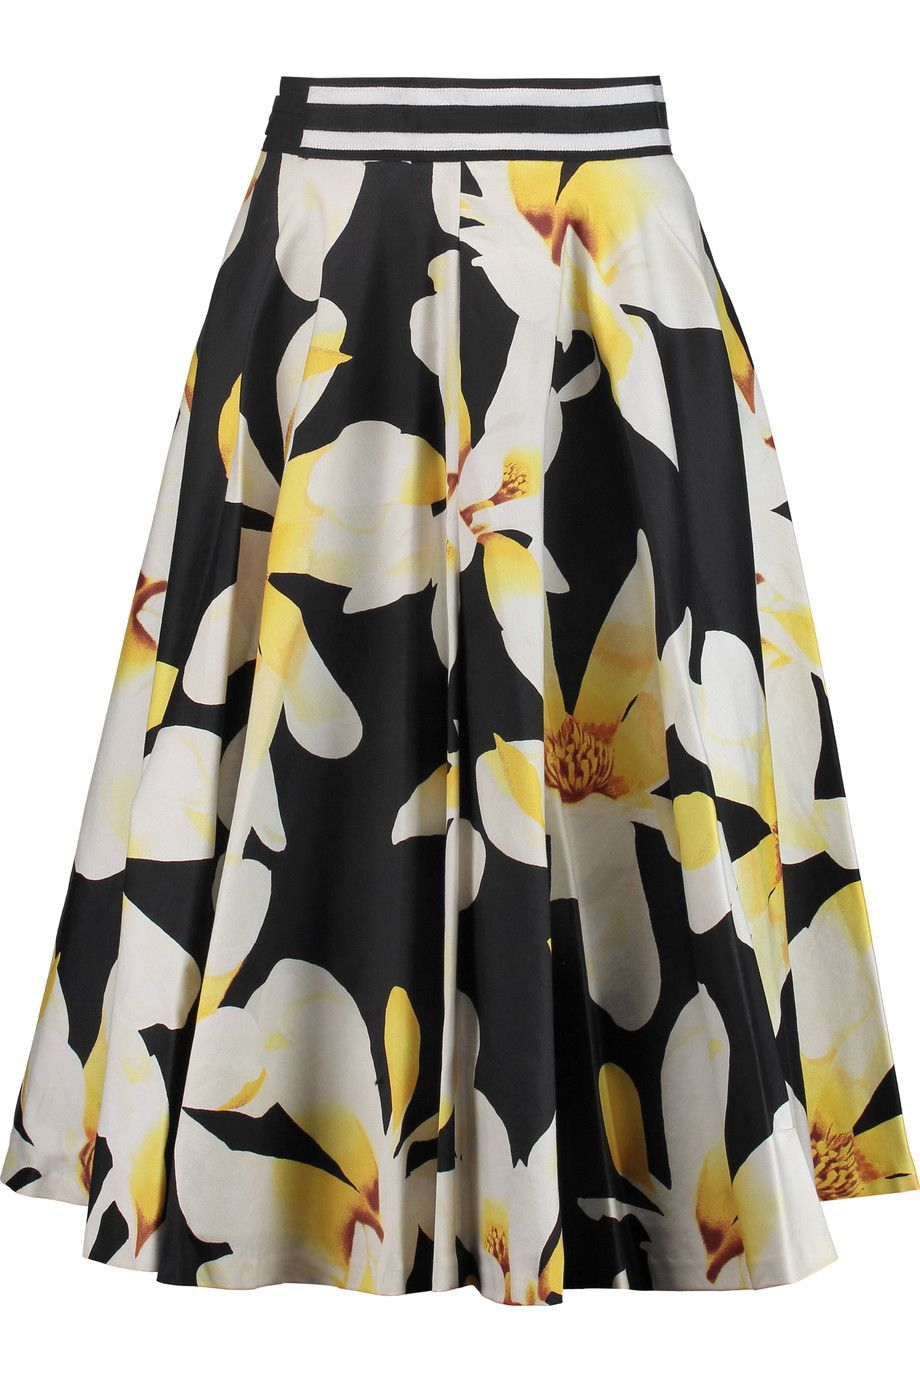 3ba958e24 ALICE AND OLIVIA Diana Pleated Printed Stretch-Cotton Crepe Skirt.  #aliceandolivia #cloth #skirt